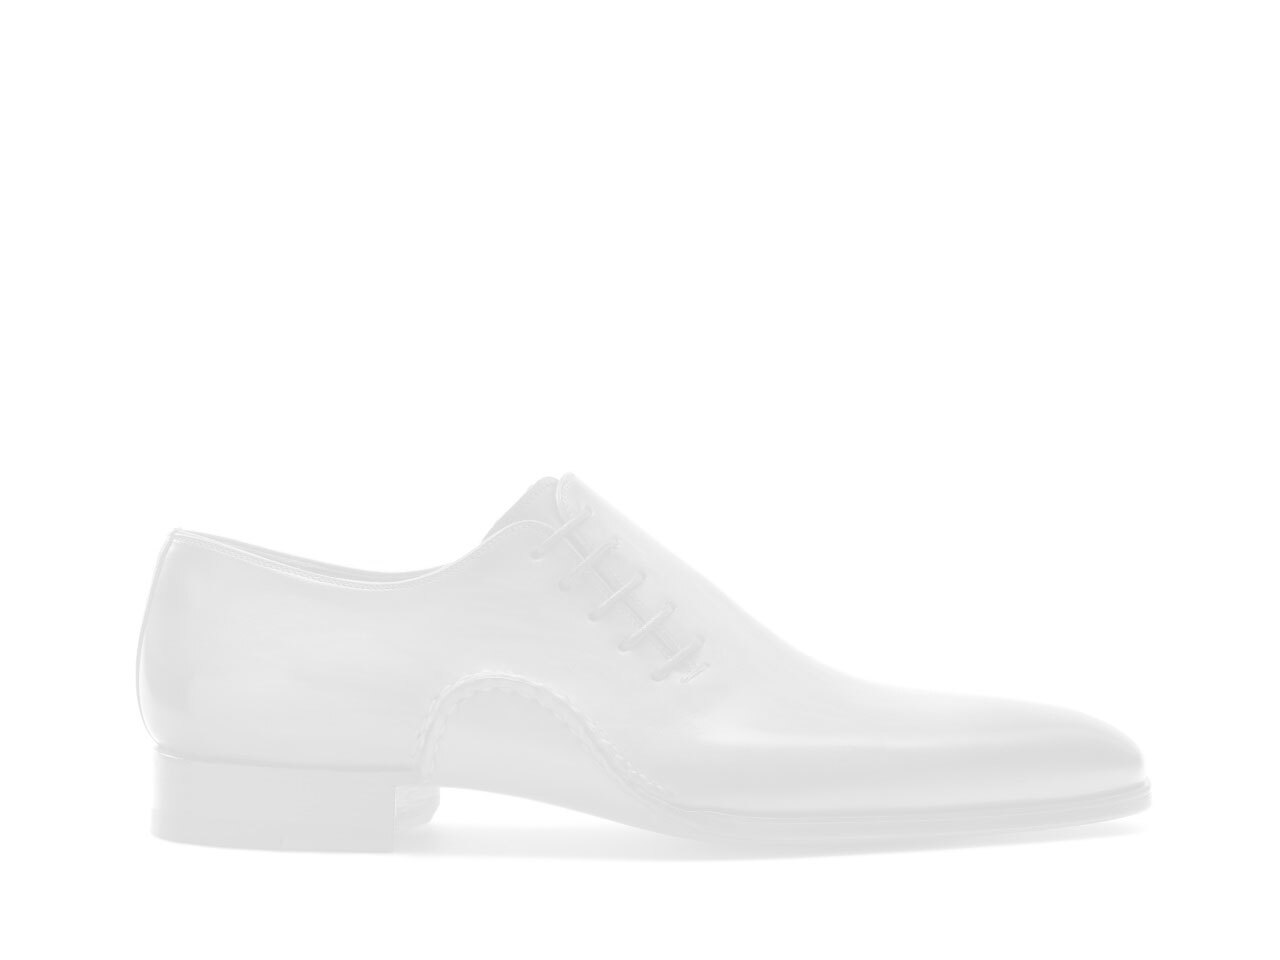 Pair of the Magnanni Heath Black Men's Sneakers